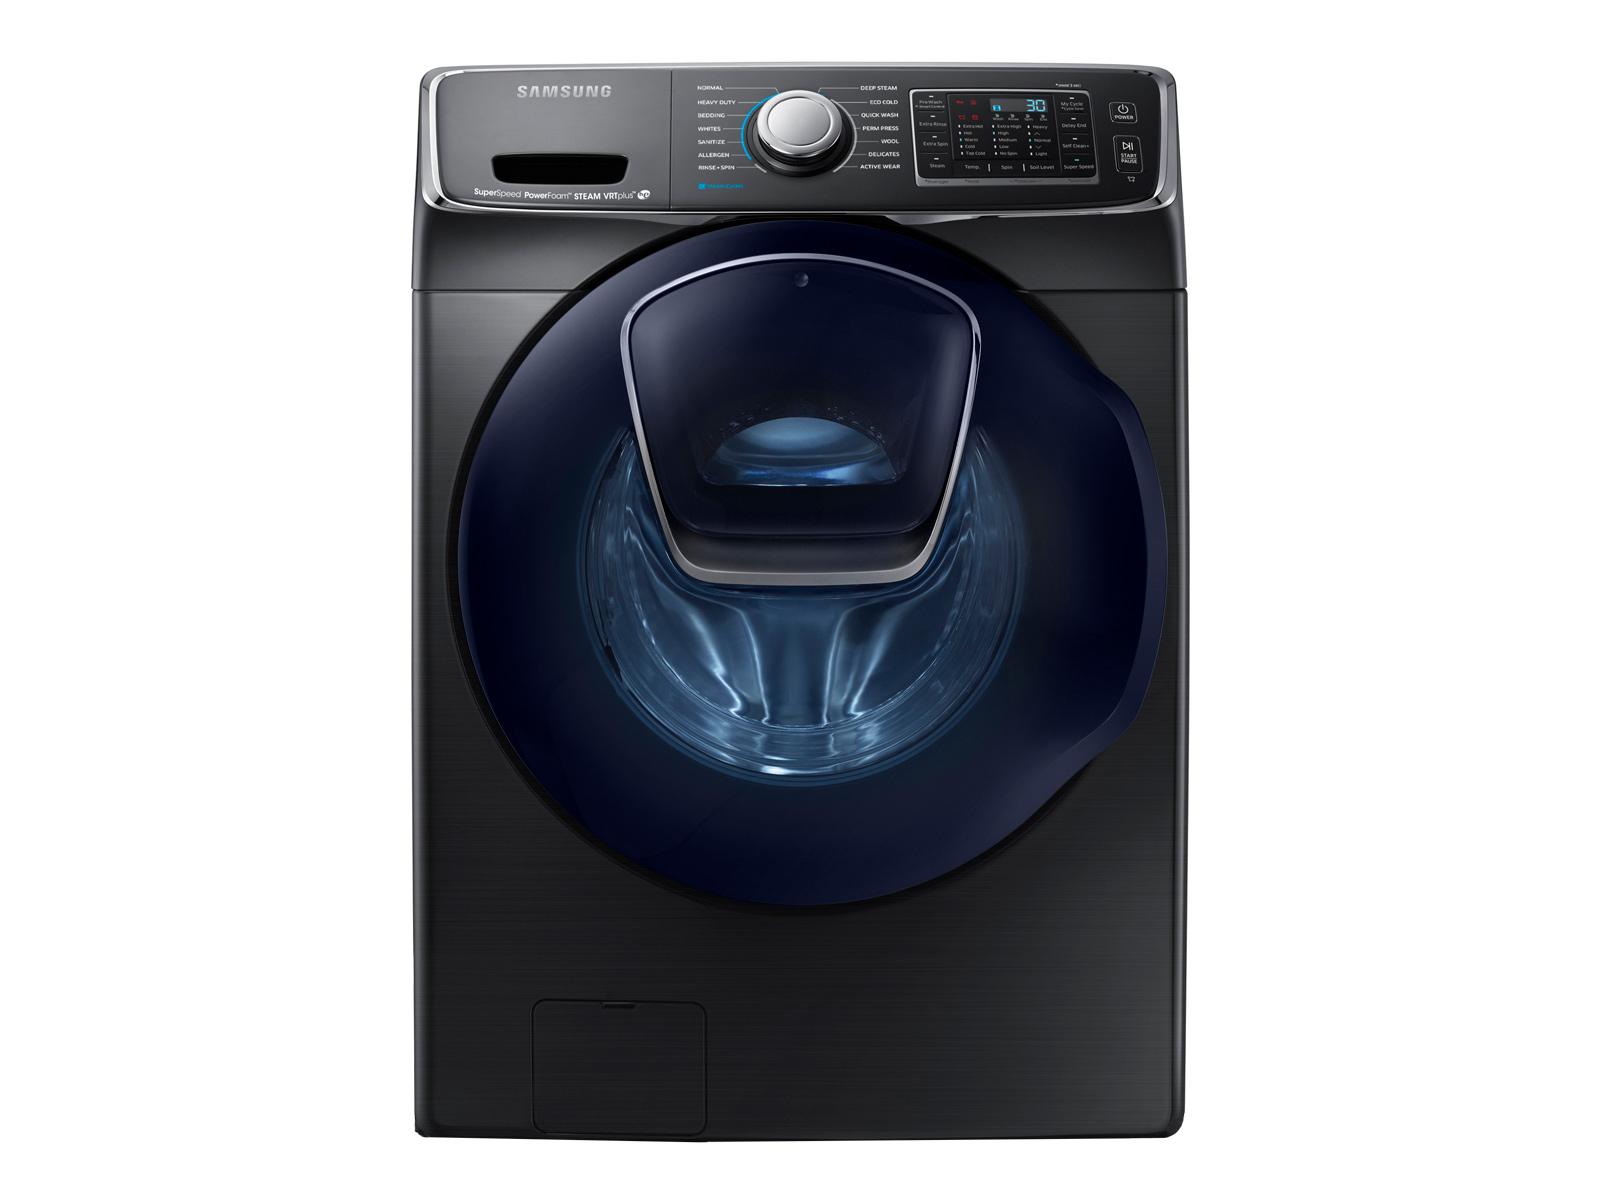 hight resolution of addwash front load washer washers wf50k7500av a2 samsung us